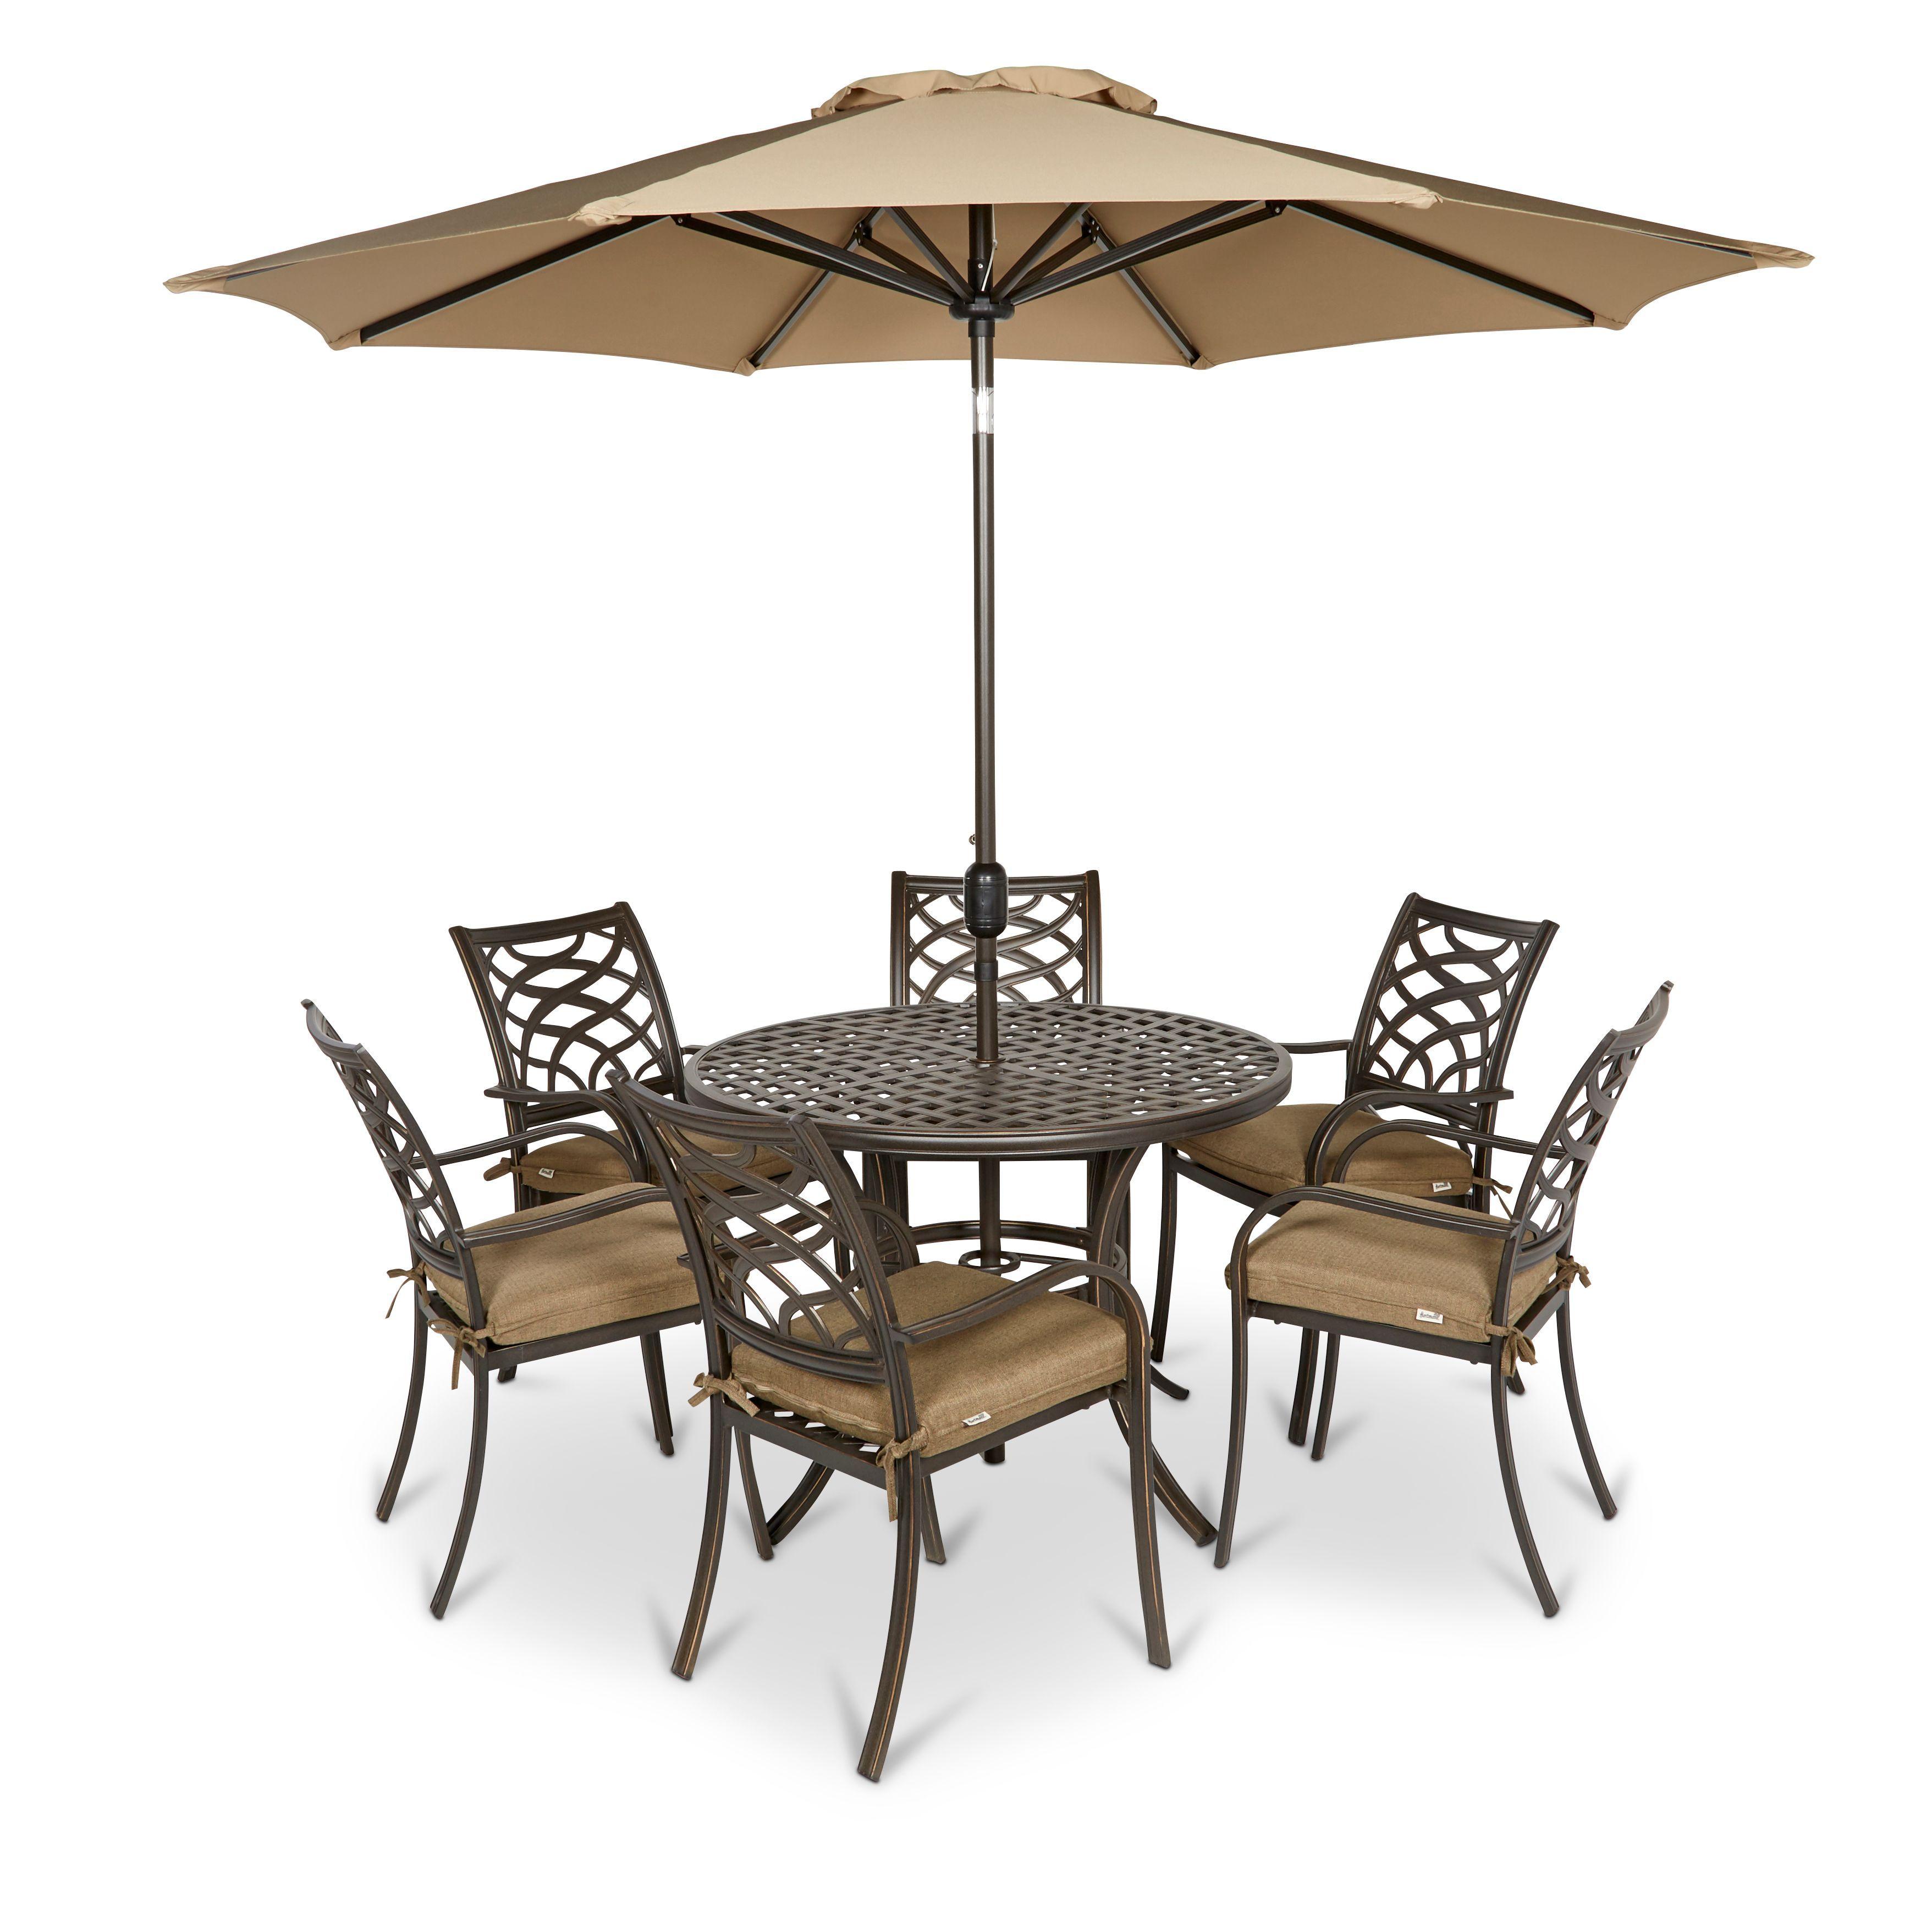 Ripley Metal 6 Seater Dining Set | Departments | DIY at B&Q | garden ...